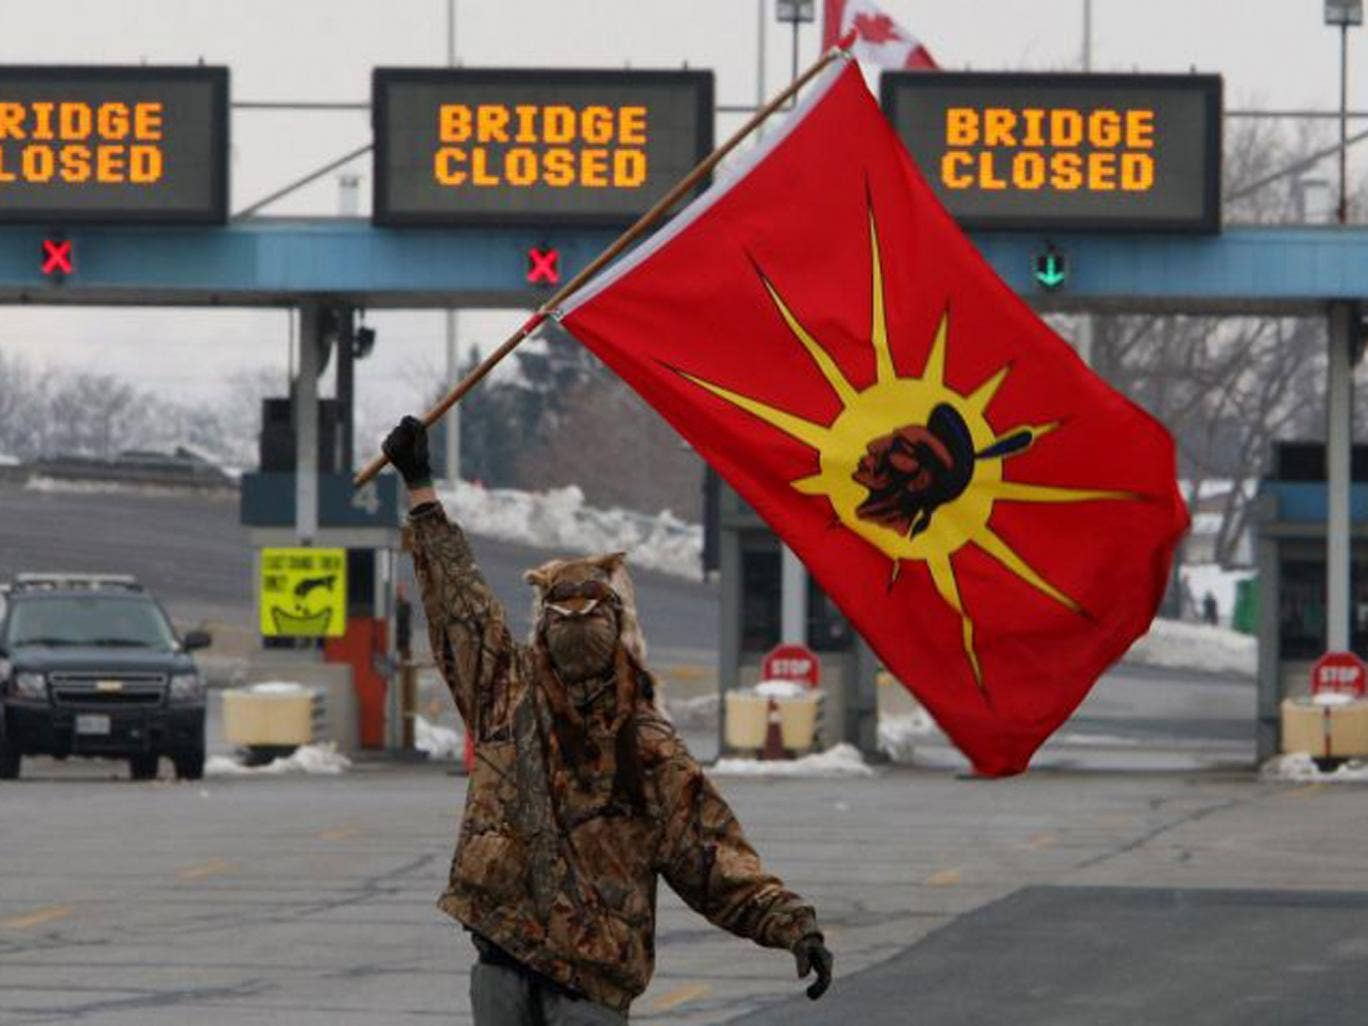 A First Nation activist at a blocked border crossing in Sarnia, Ontario